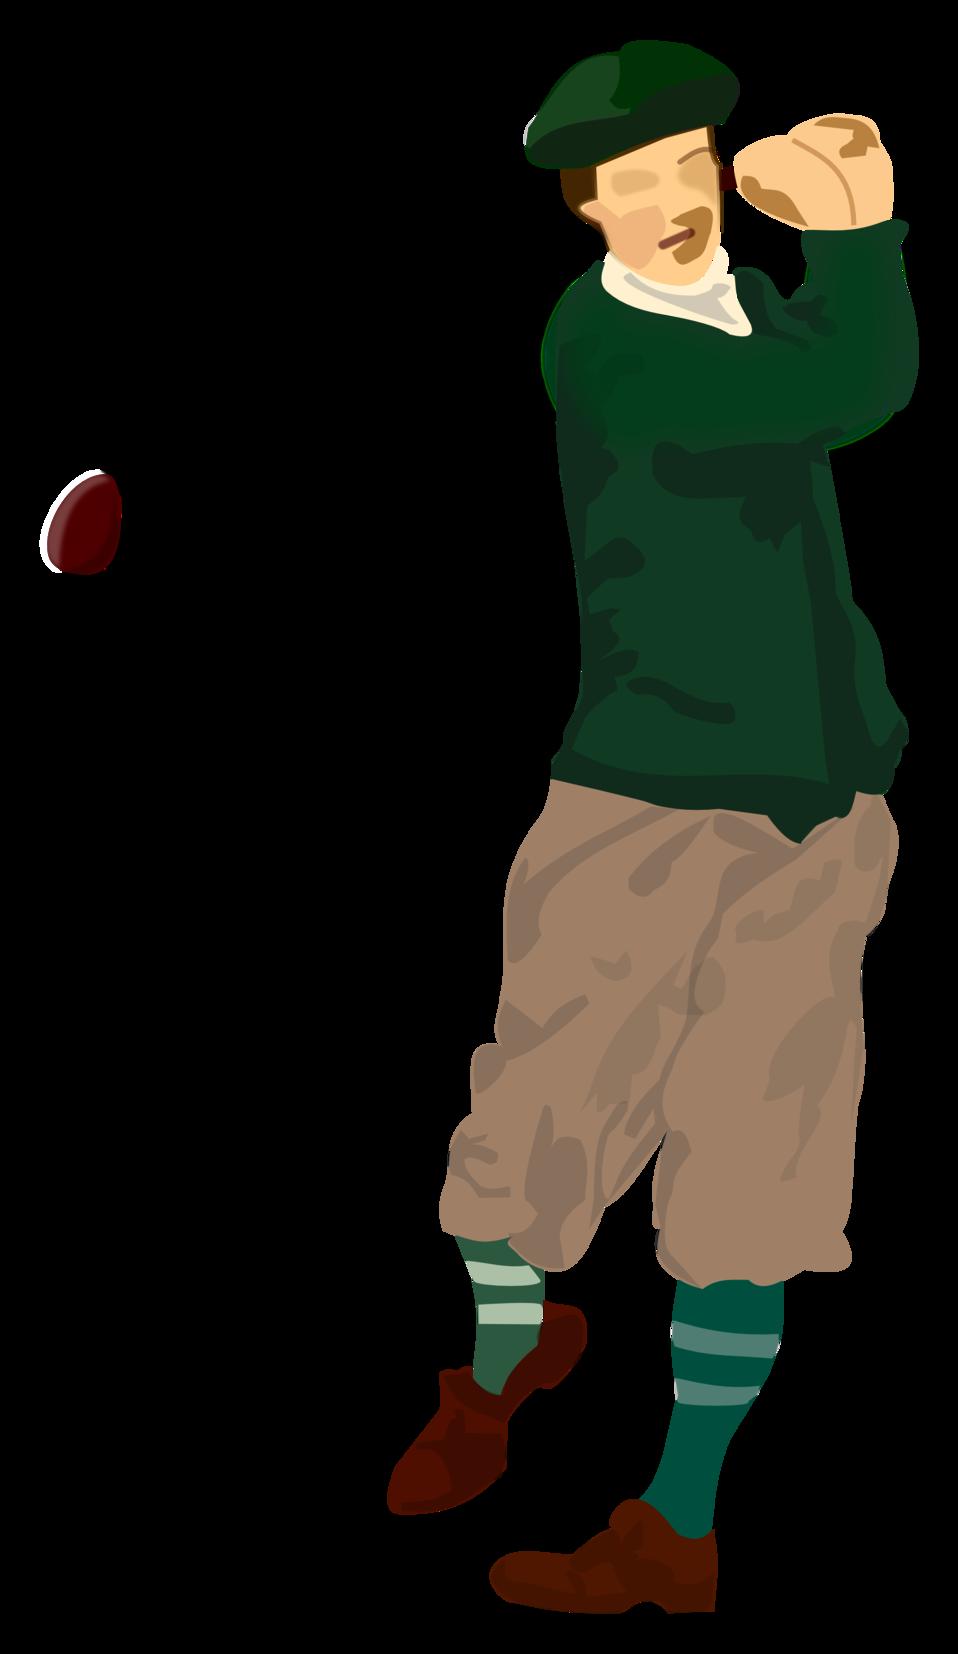 Public domain clip art. Golf clipart golf game